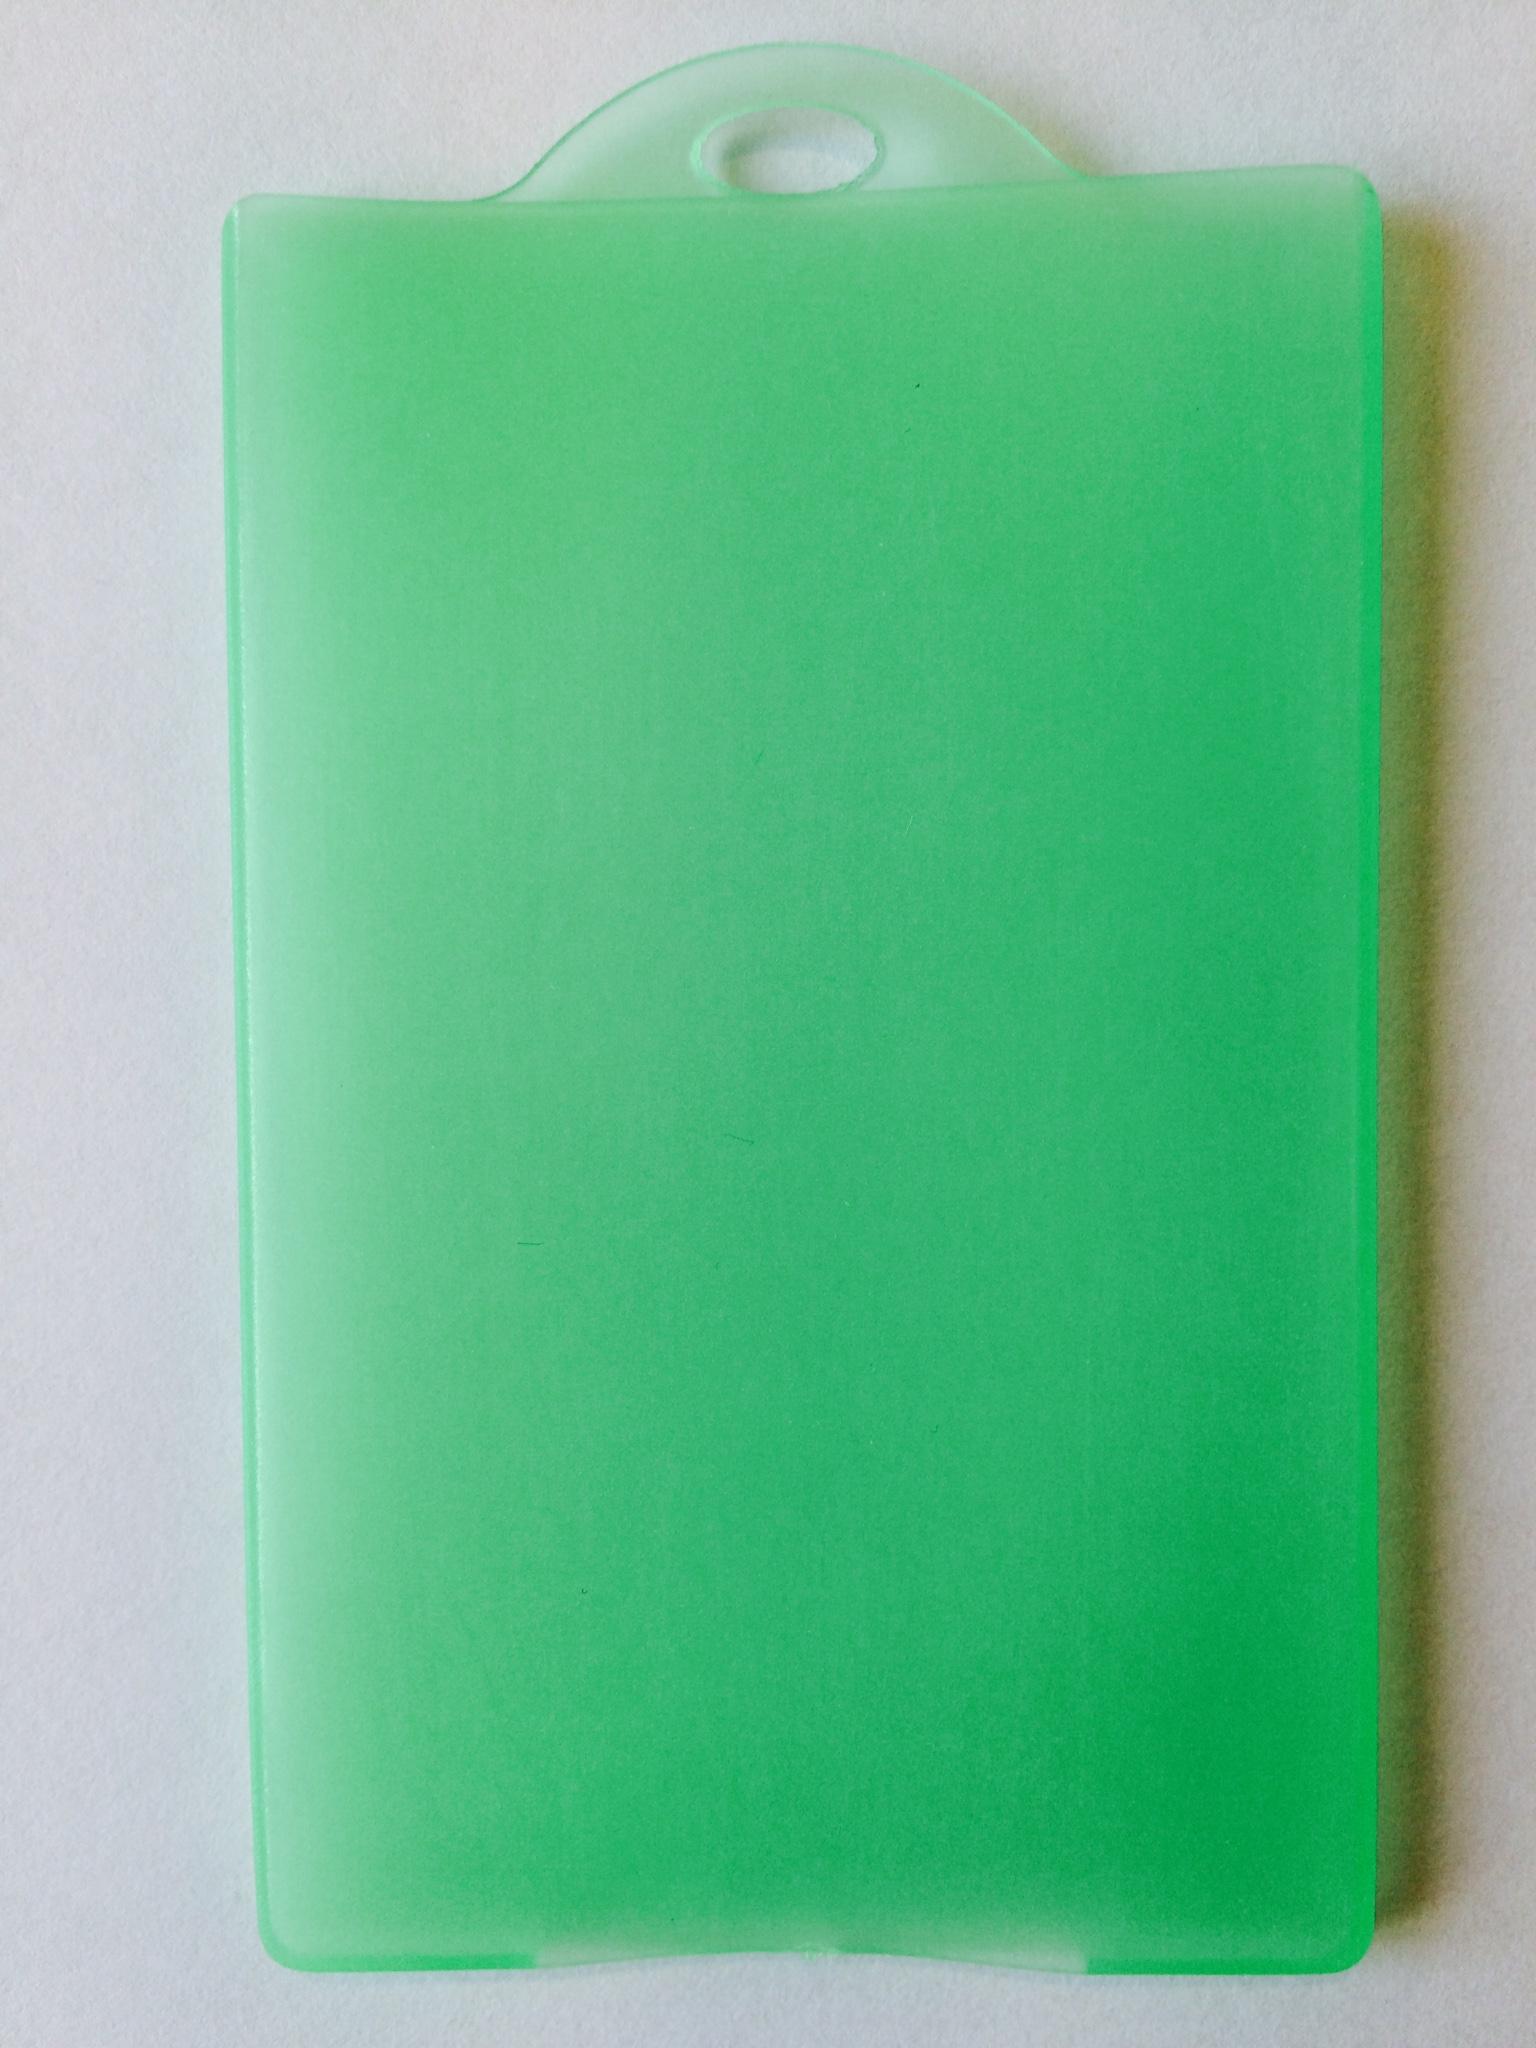 cf71a5cdb40 OV-chipkaart hoesje multicolor - OV Accessoires - OVshop.nl